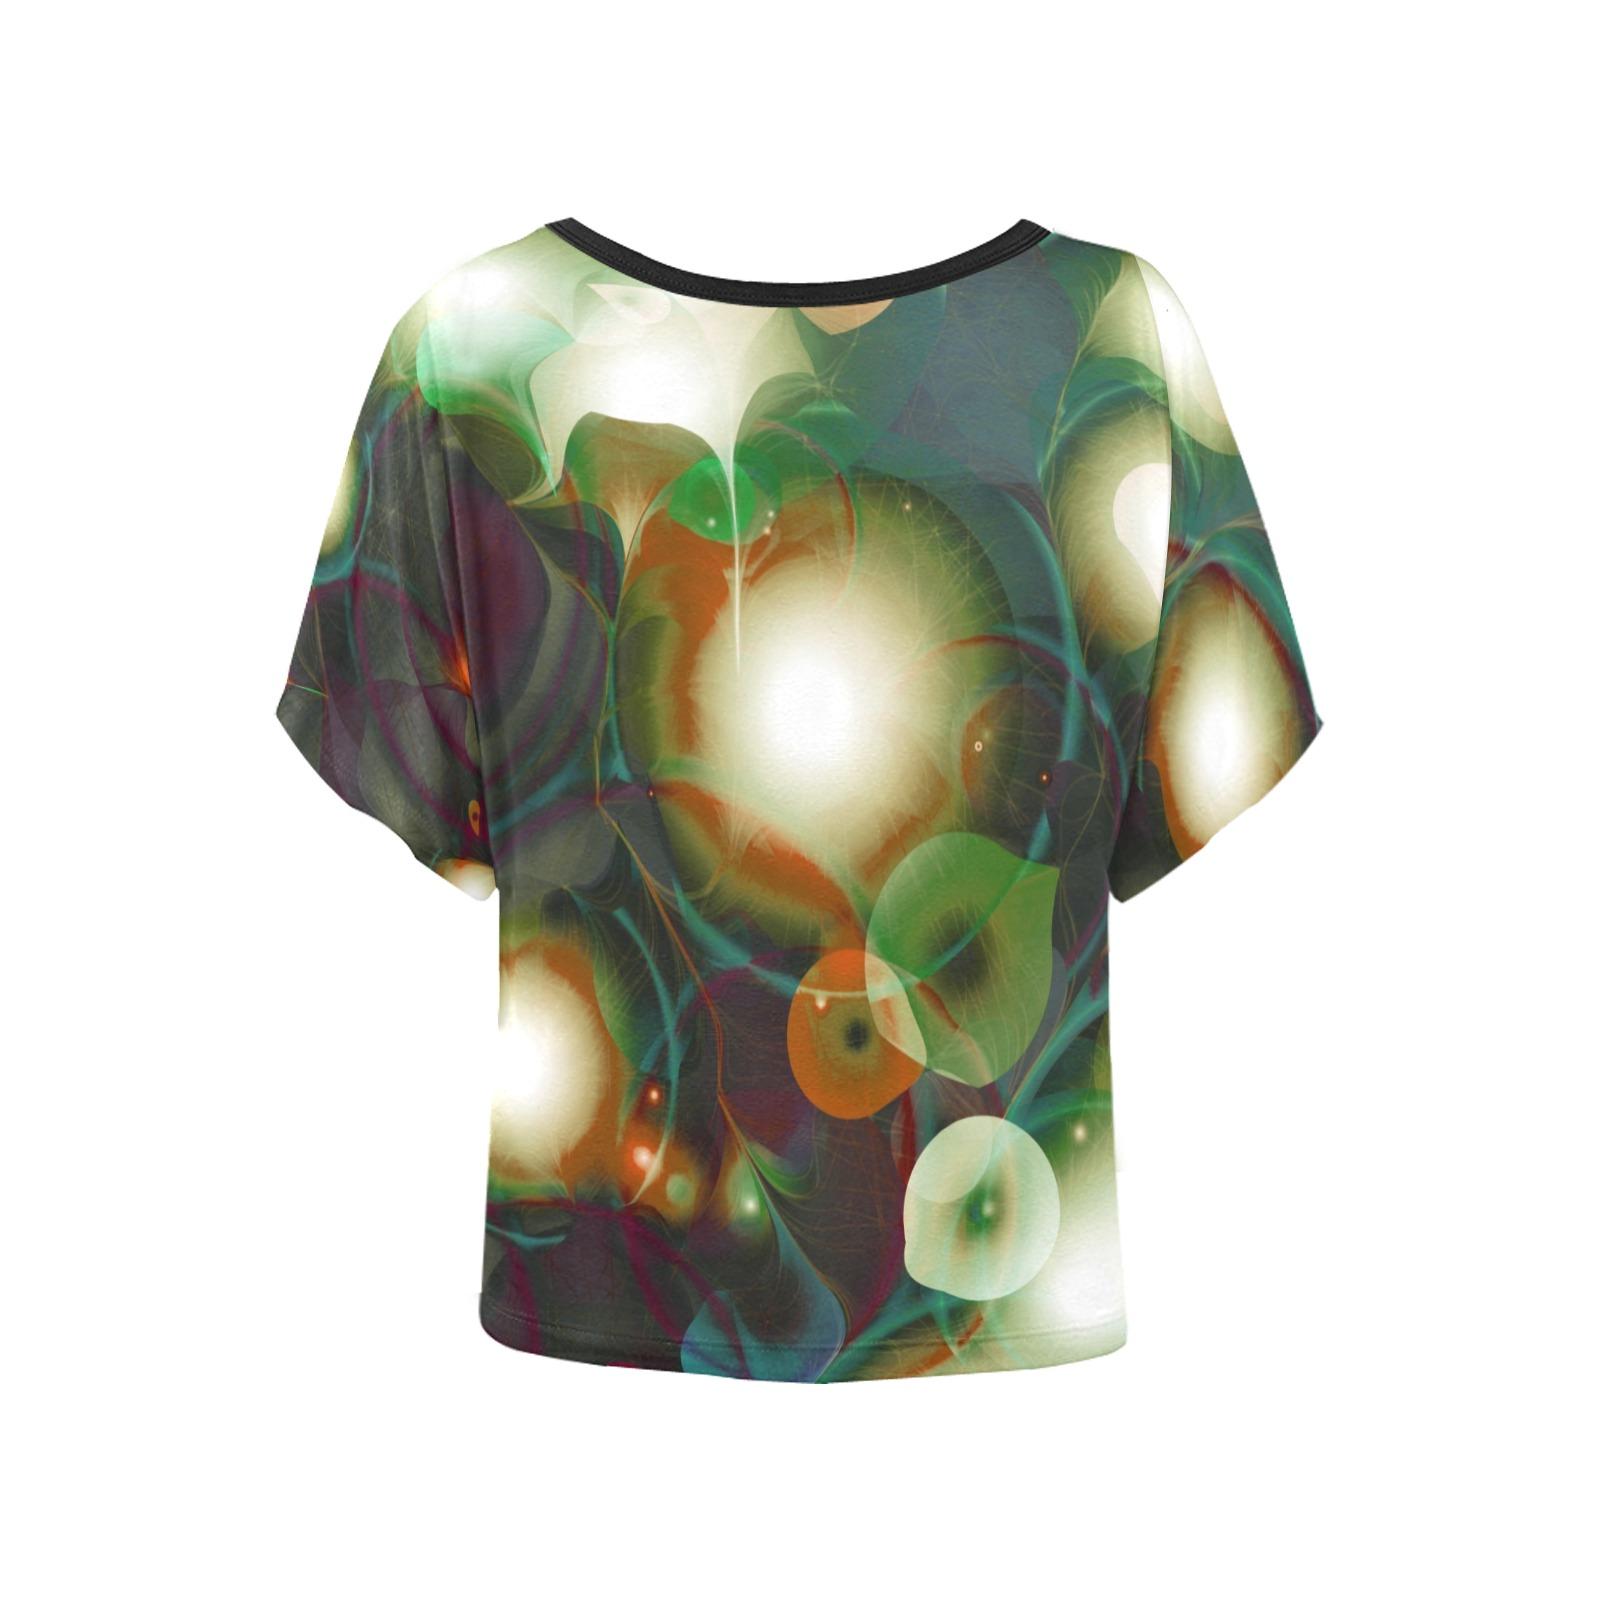 melting bubbles8 Women's Batwing-Sleeved Blouse T shirt (Model T44)